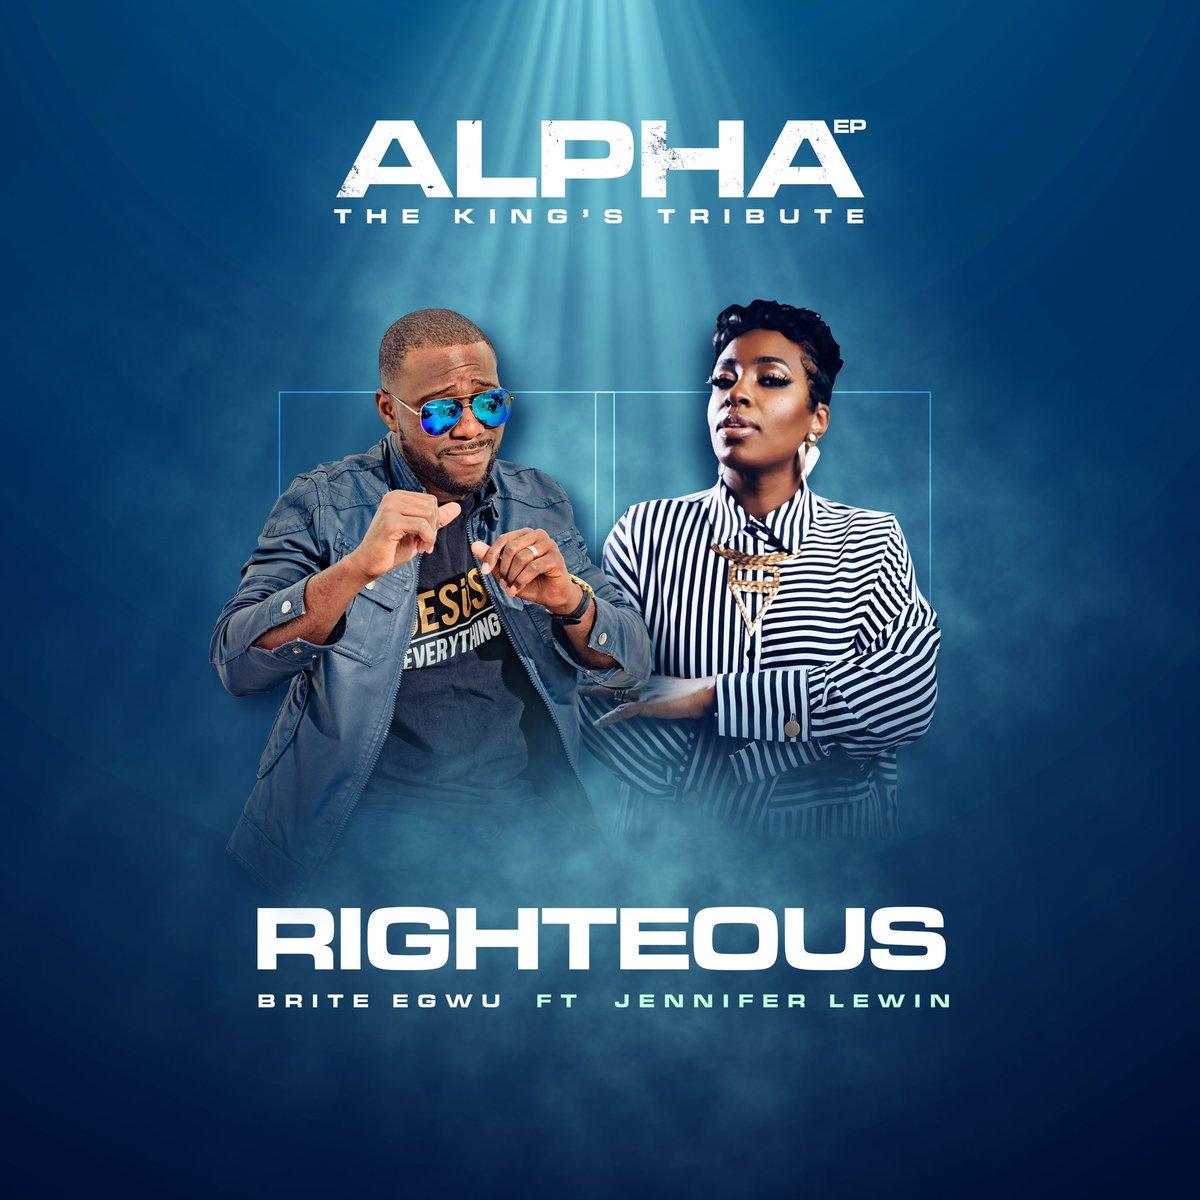 Brite Egwu - Righteous ft. Jennifer Lewin